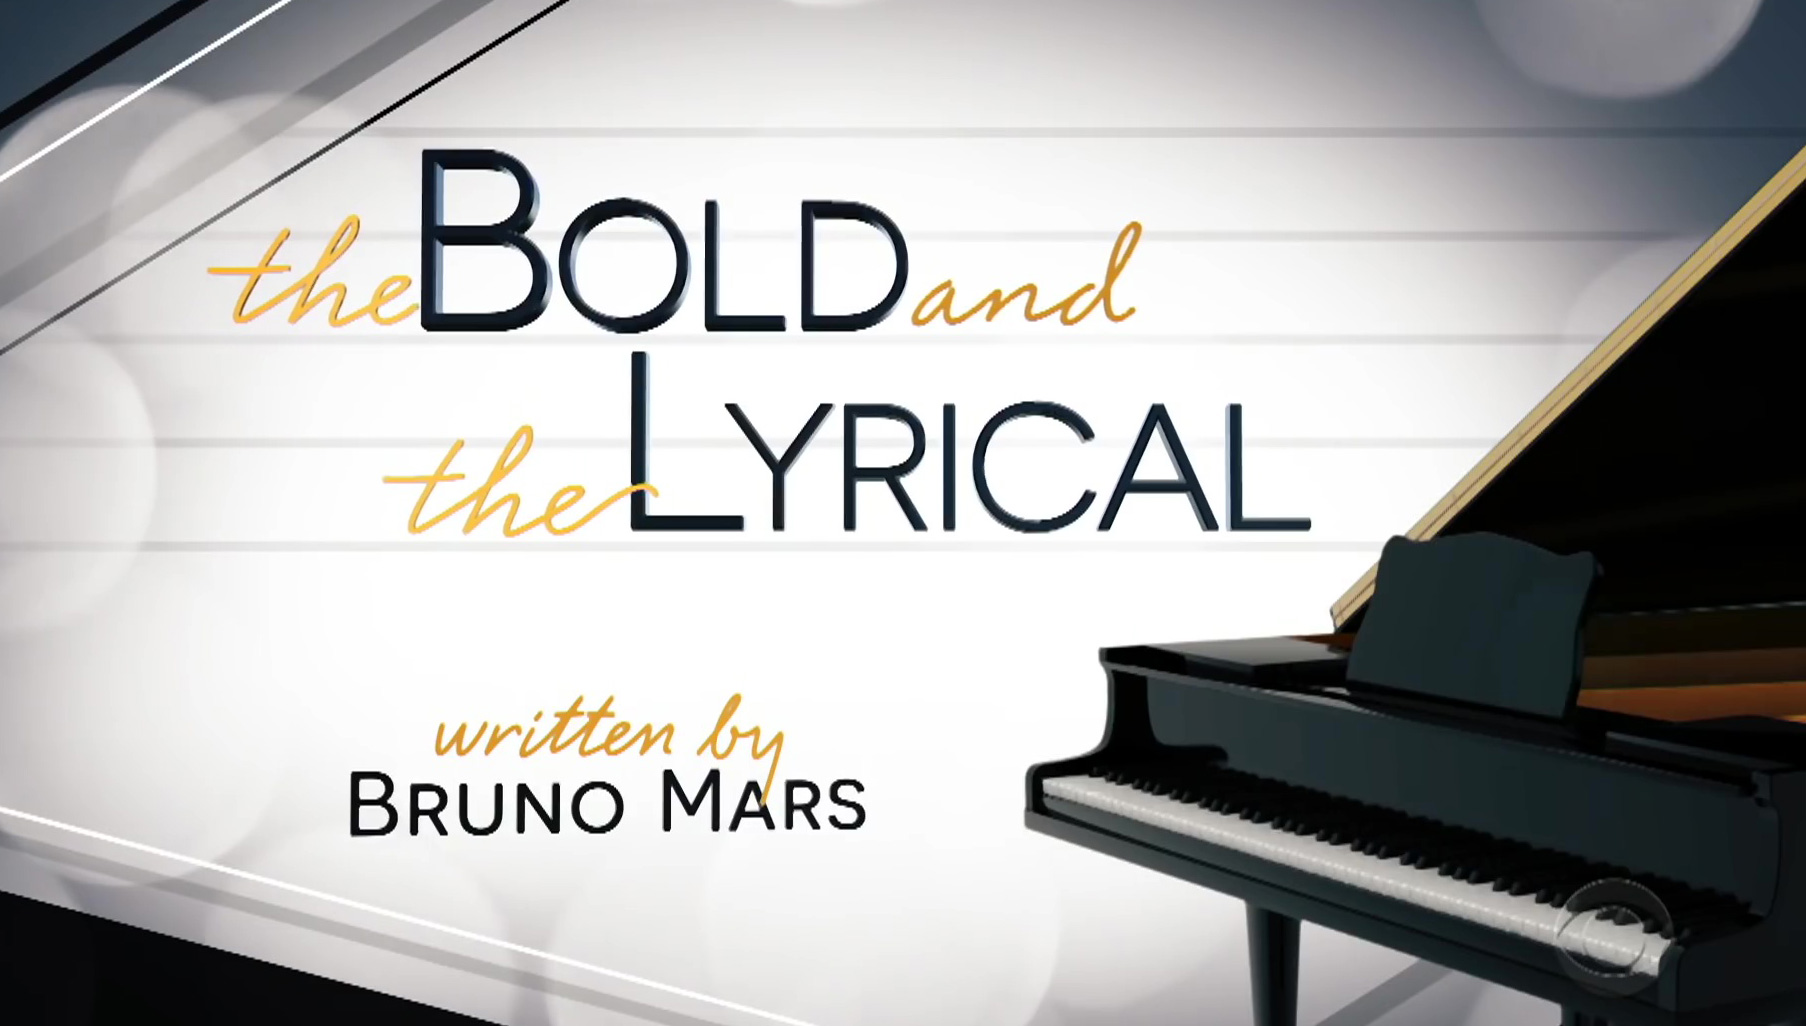 Bruno Mars Soap Opera w/ Kate Beckinsale & Milo Ventimiglia